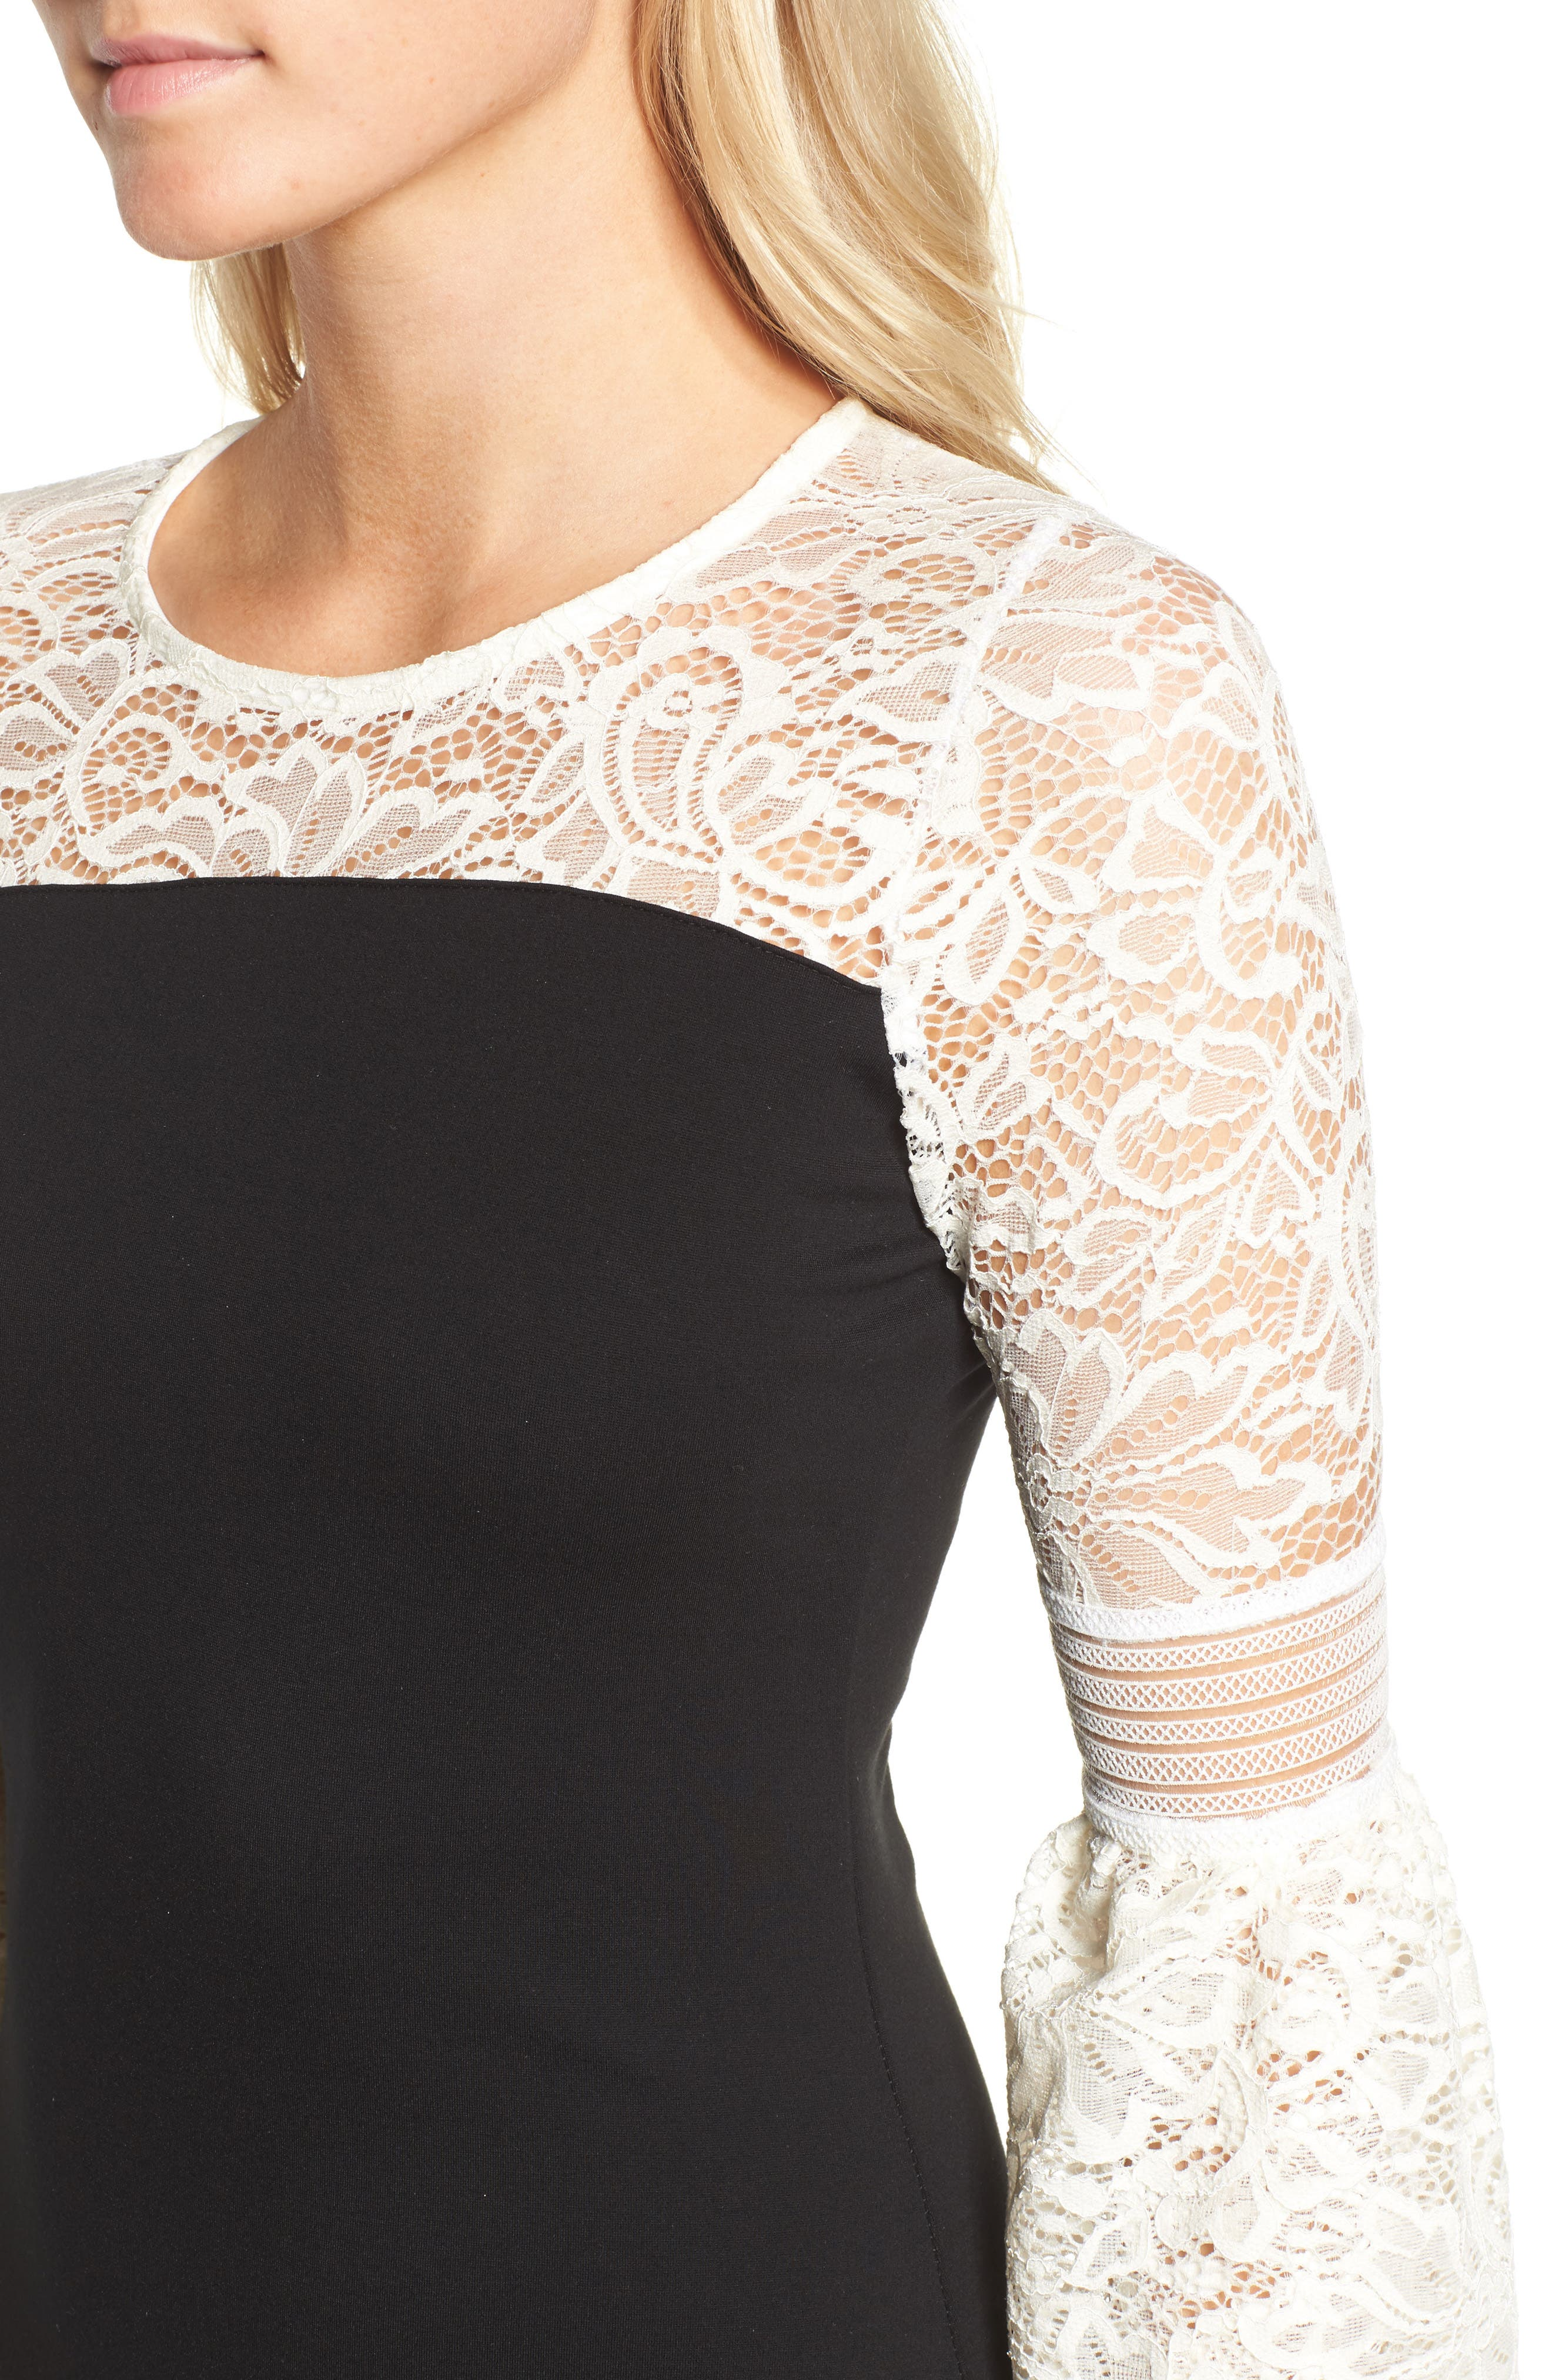 Floetry Bell Sleeve Sheath Dress,                             Alternate thumbnail 4, color,                             Cream Lace/ Black